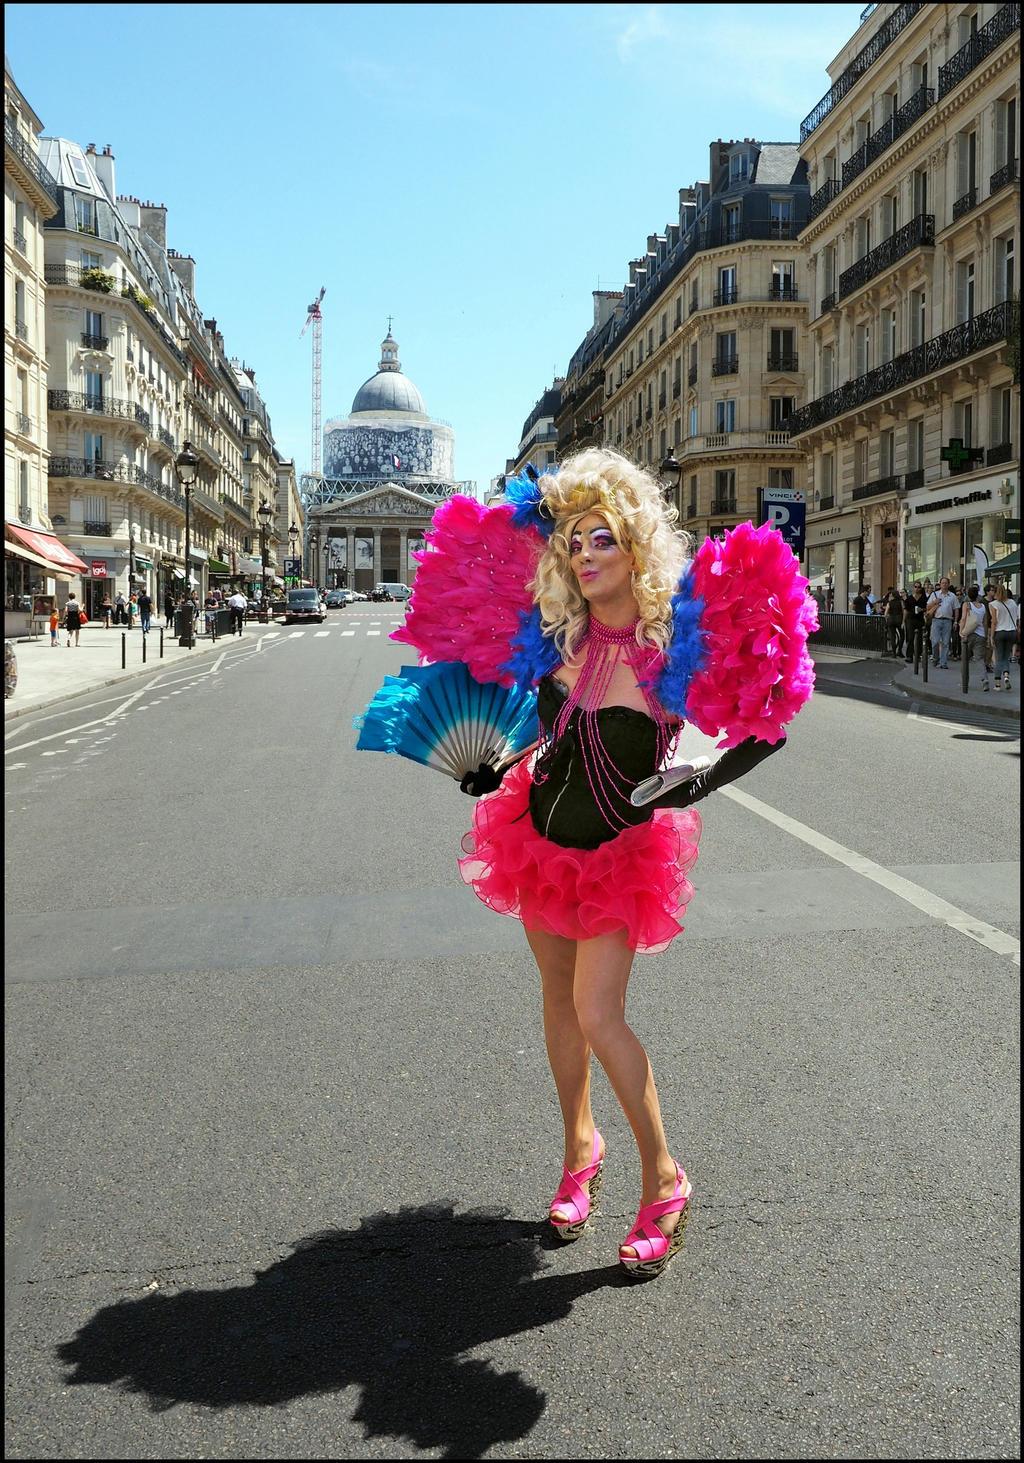 piraeus lesbian dating site Free dating site in ukraine  ukraine free dating site lesbian dating app reviews  piraeus dating service designed to hundreds of active members.